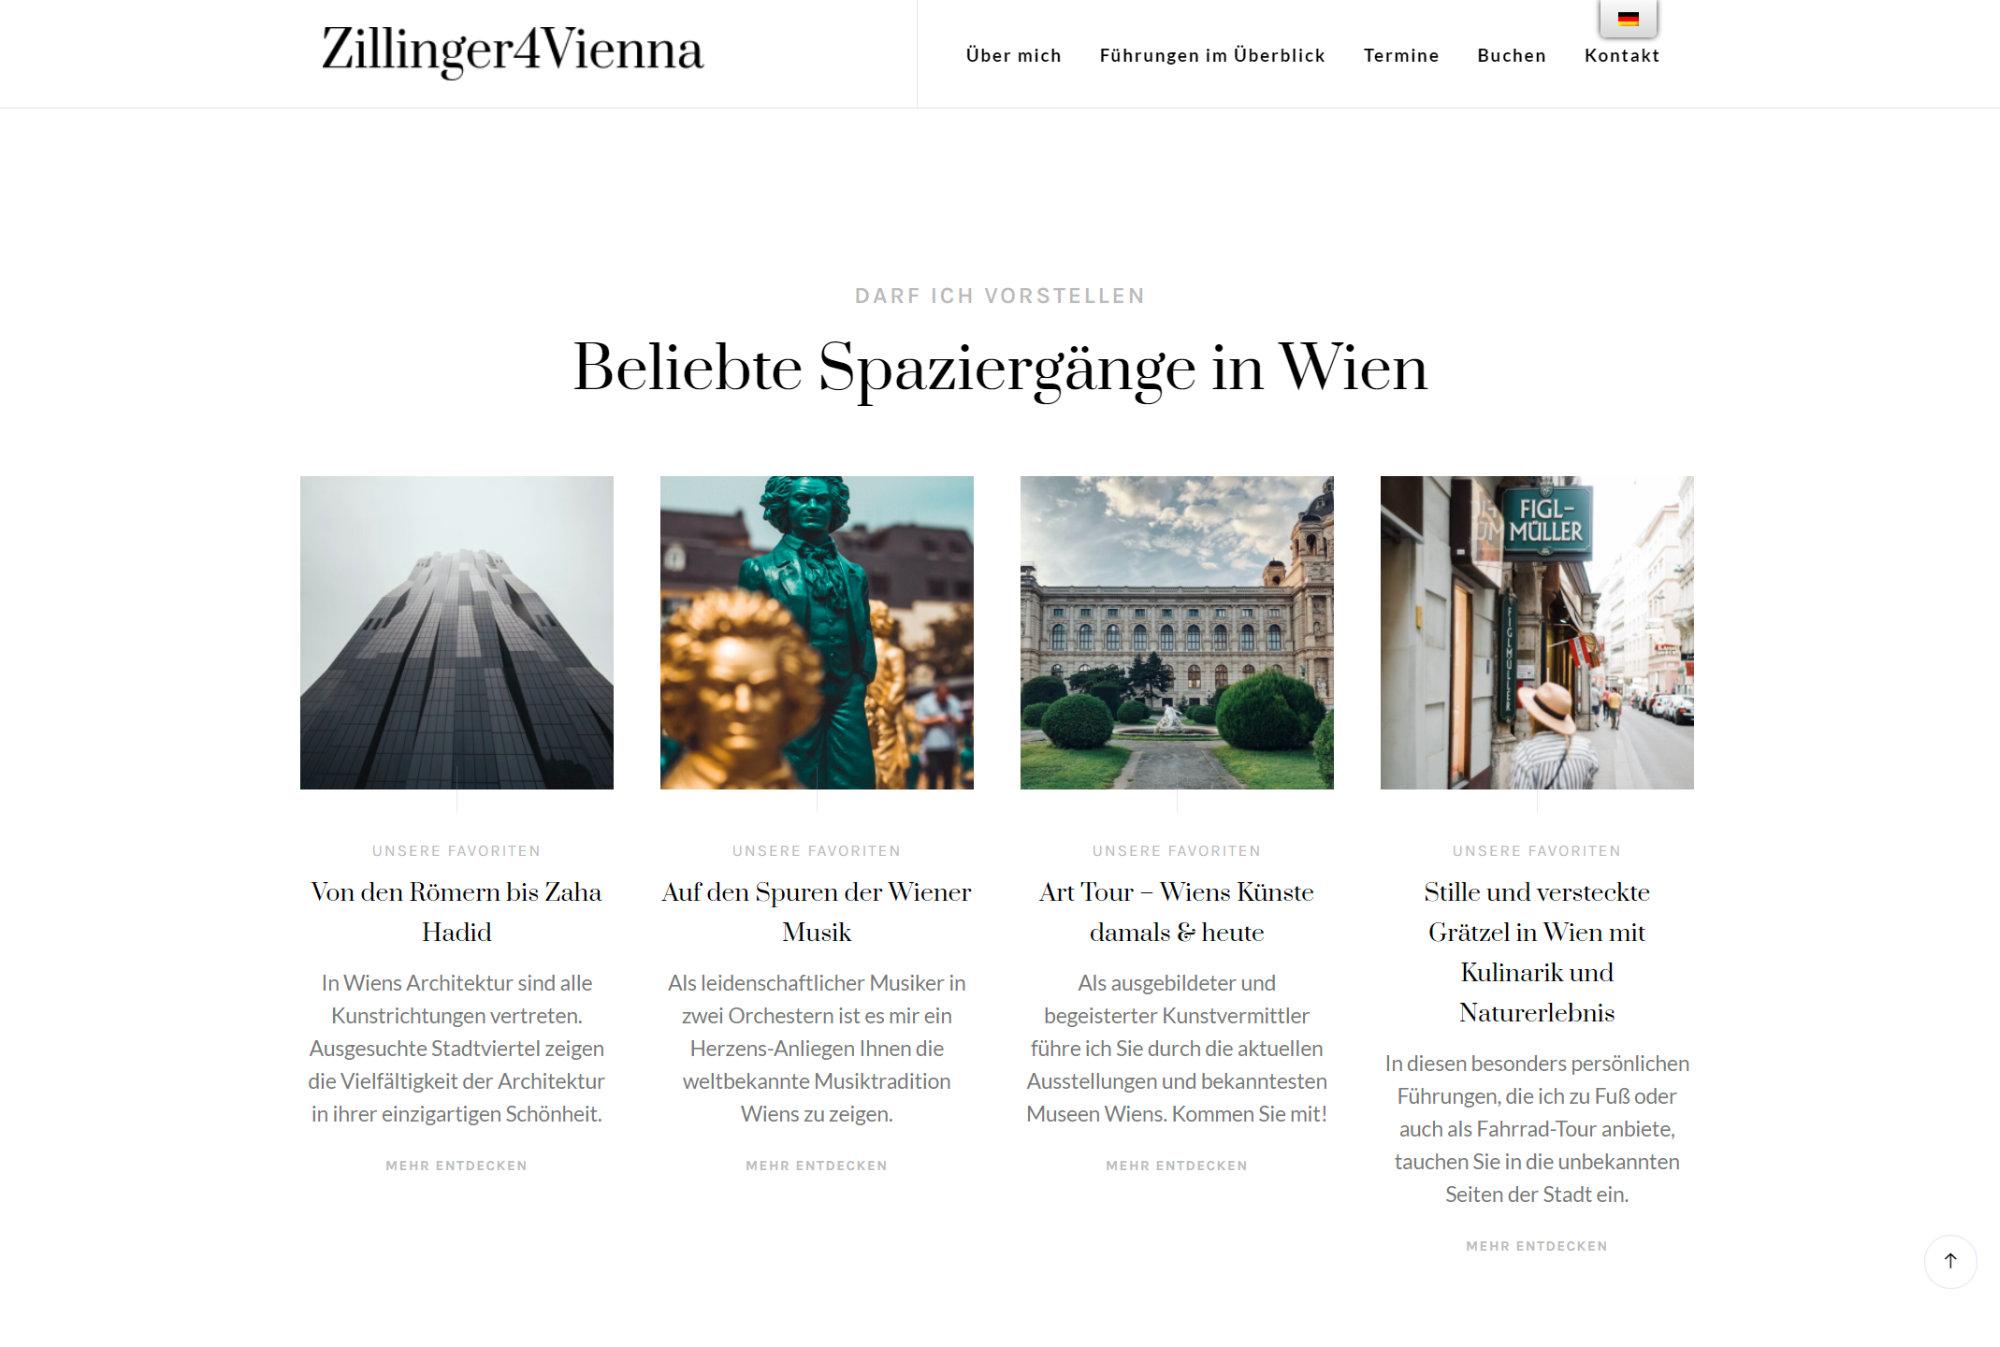 whateverworks-Zillinger4Vienna-F